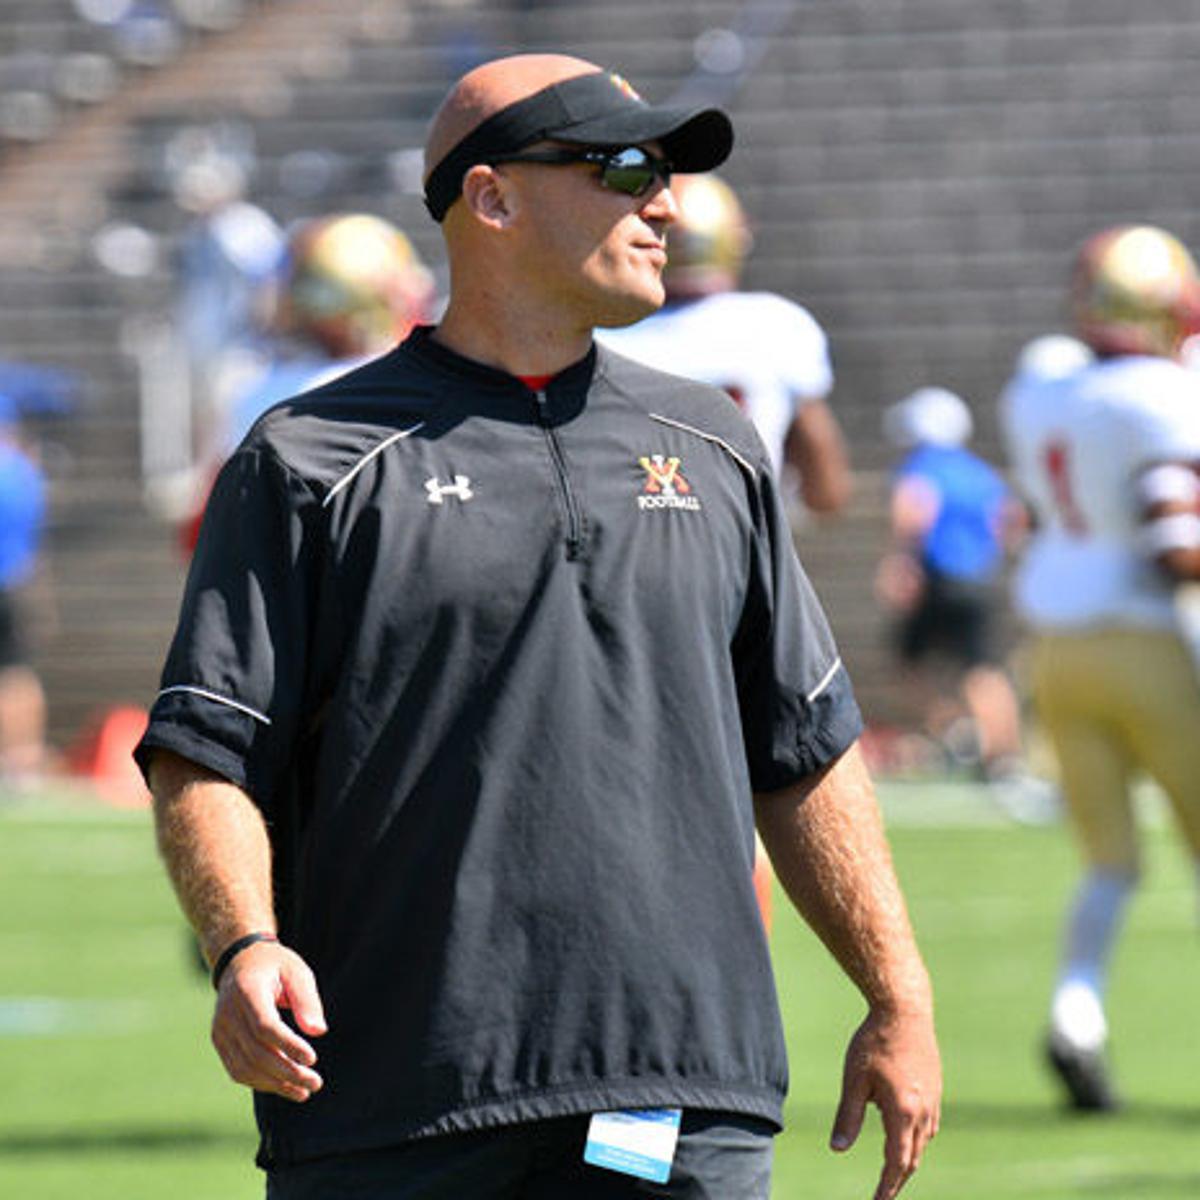 LOCALS IN COLLEGE: Robbins, Hamilton take new coaching jobs